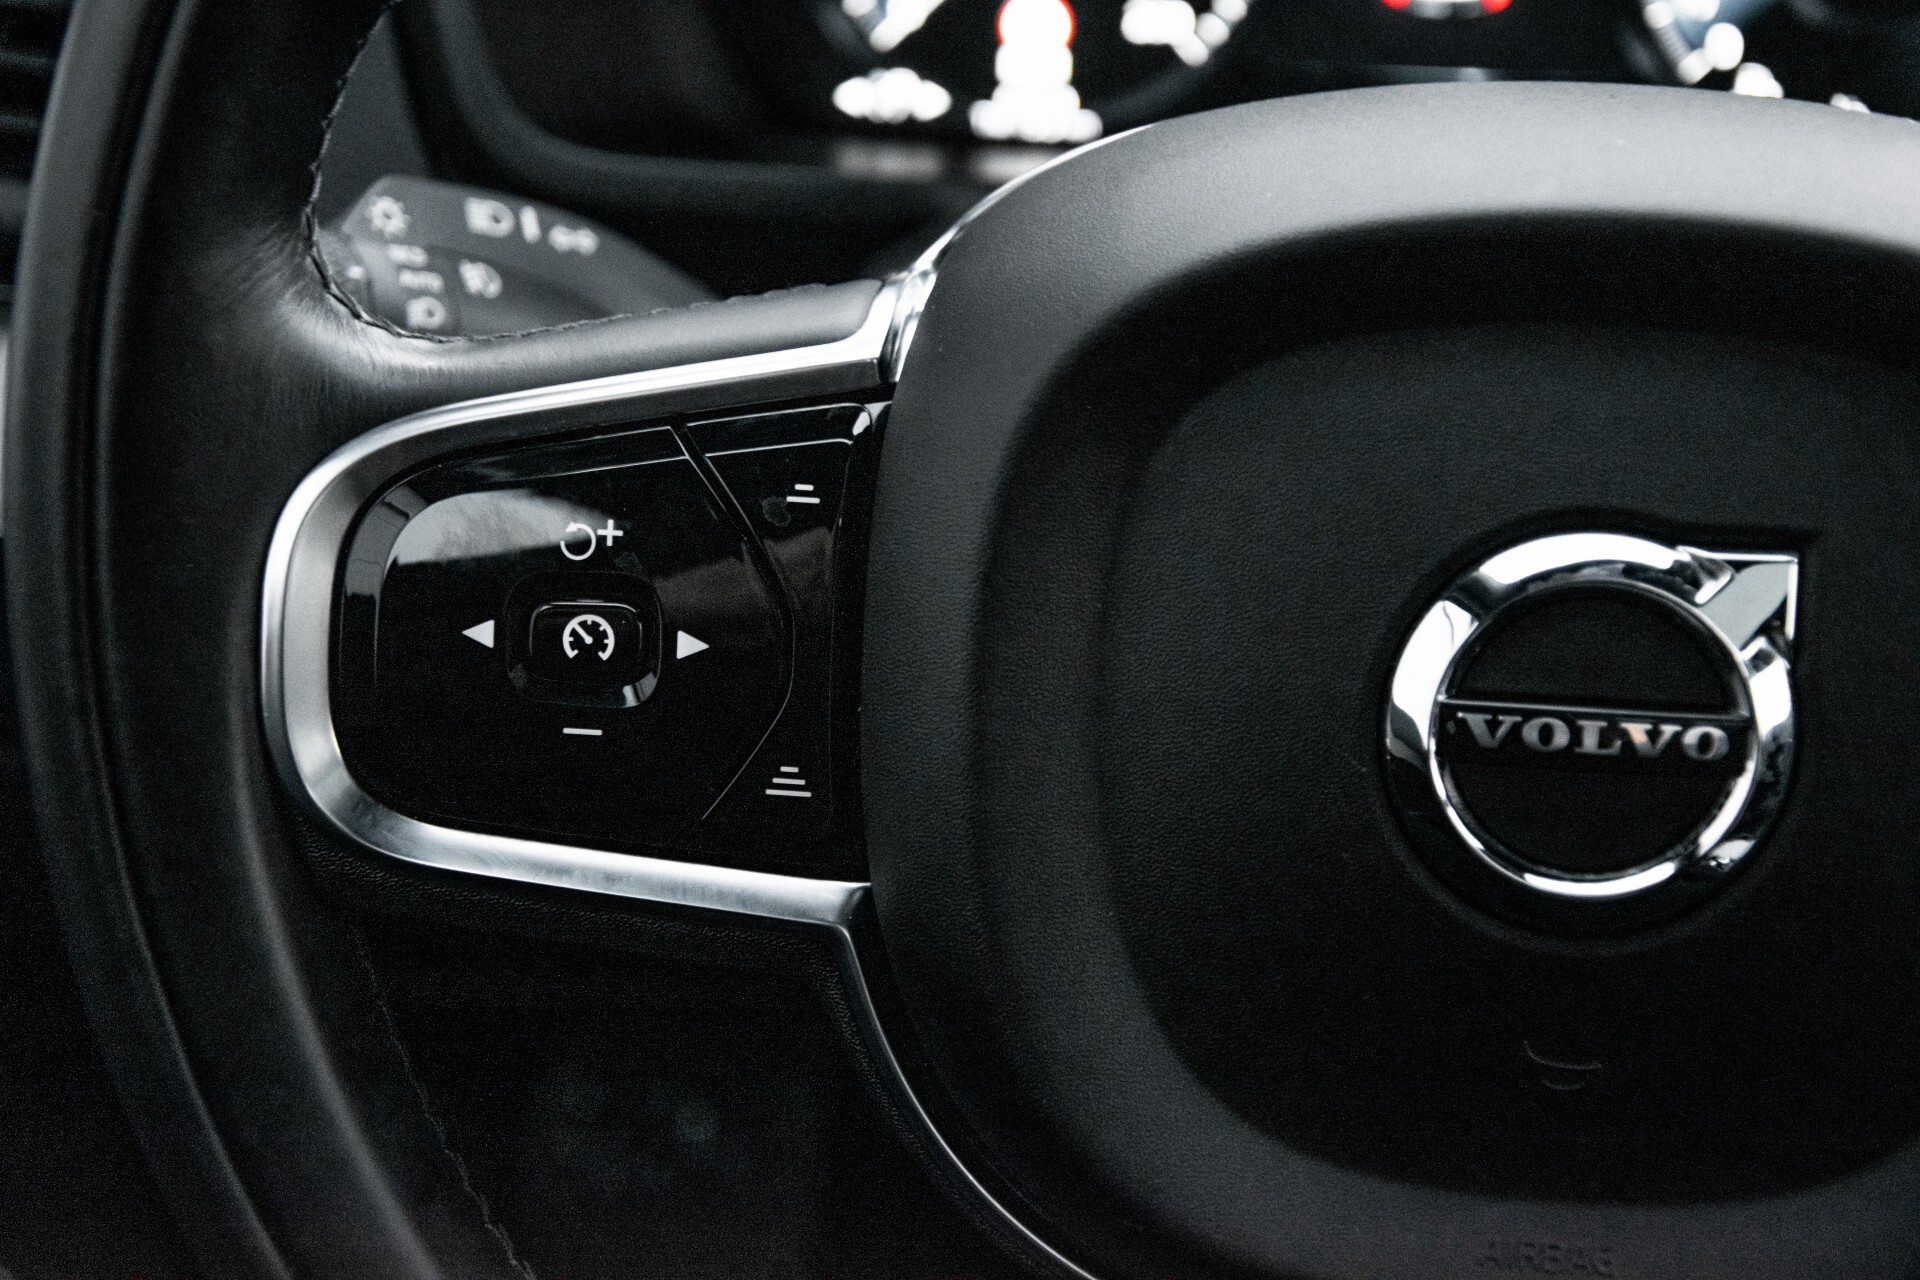 "Volvo XC90 2.0 T6 AWD R-Design Panorama/Keyless/B&W/ACC/Standkachel/22"" Aut8 Foto 10"